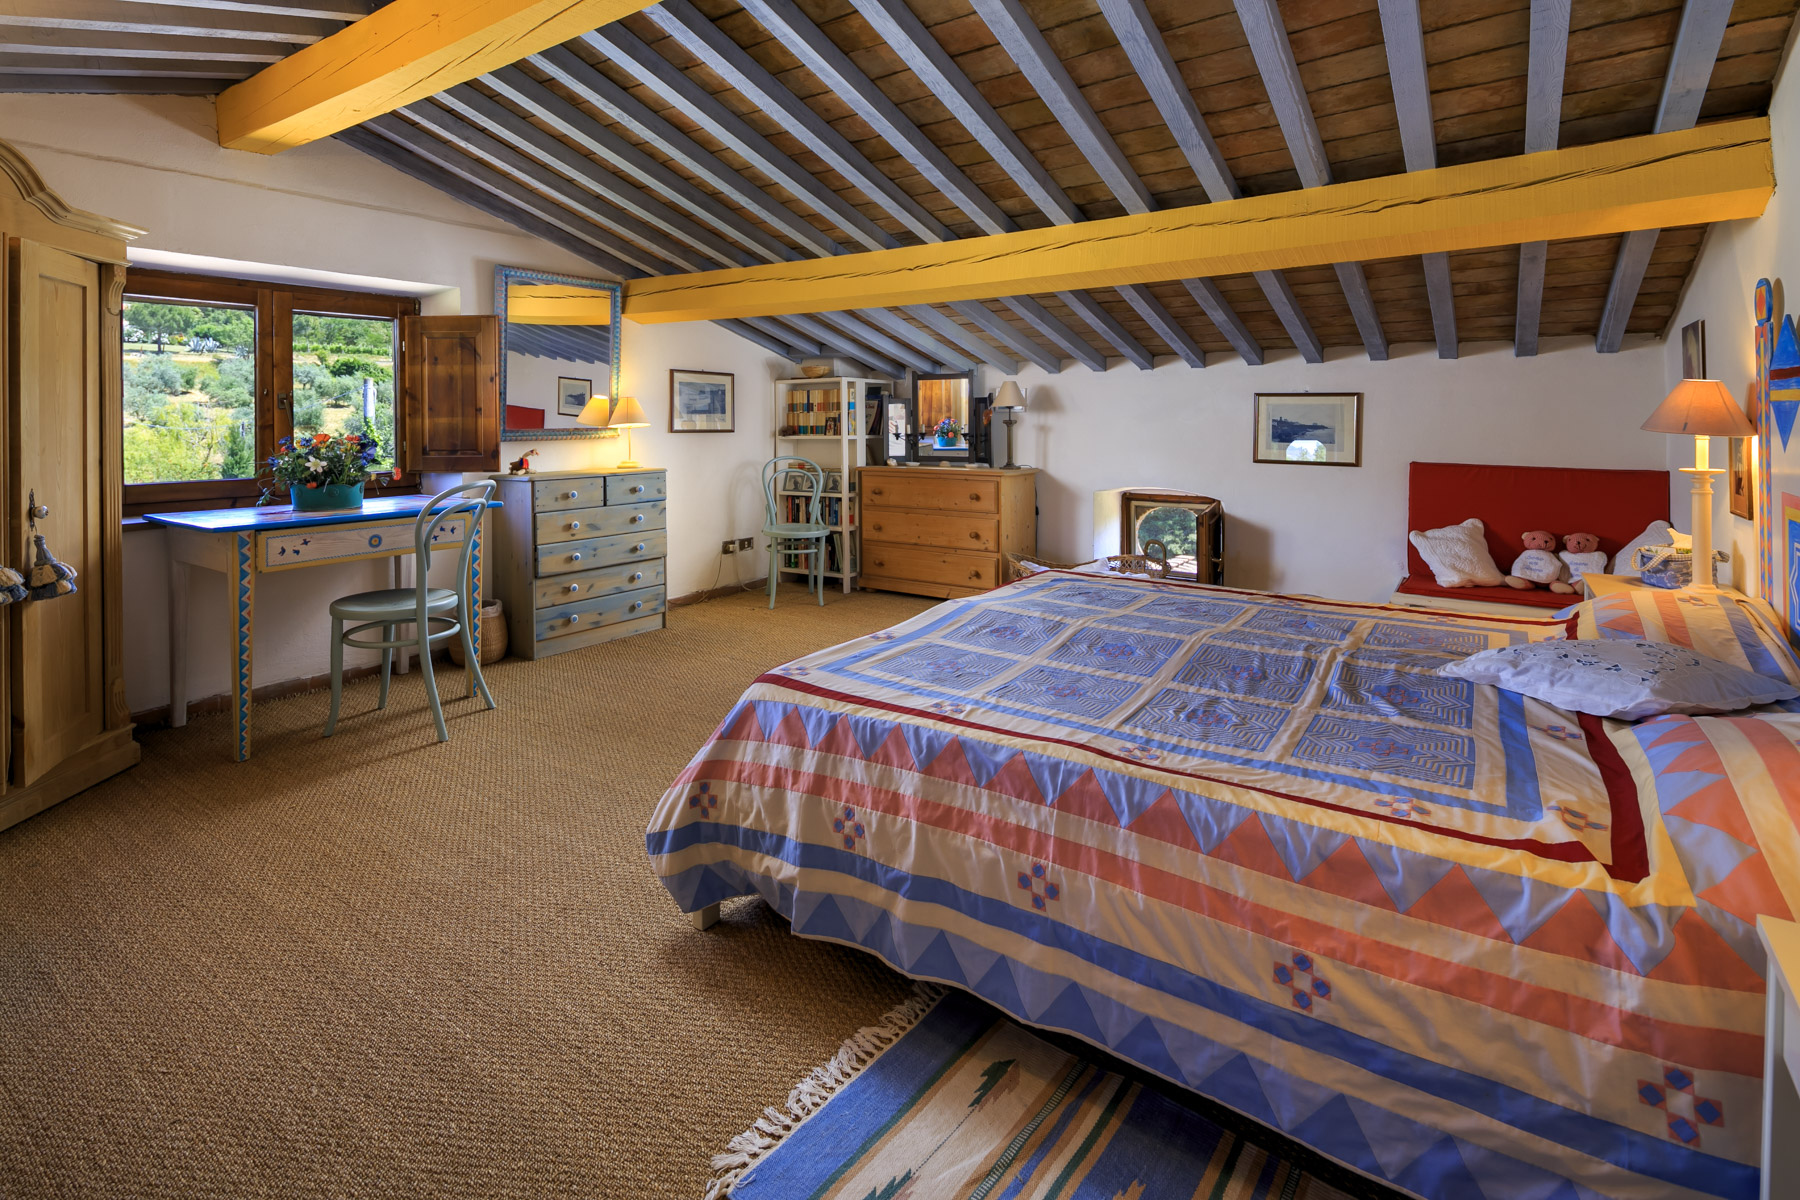 Villa in Vendita a Santa Luce: 5 locali, 270 mq - Foto 24